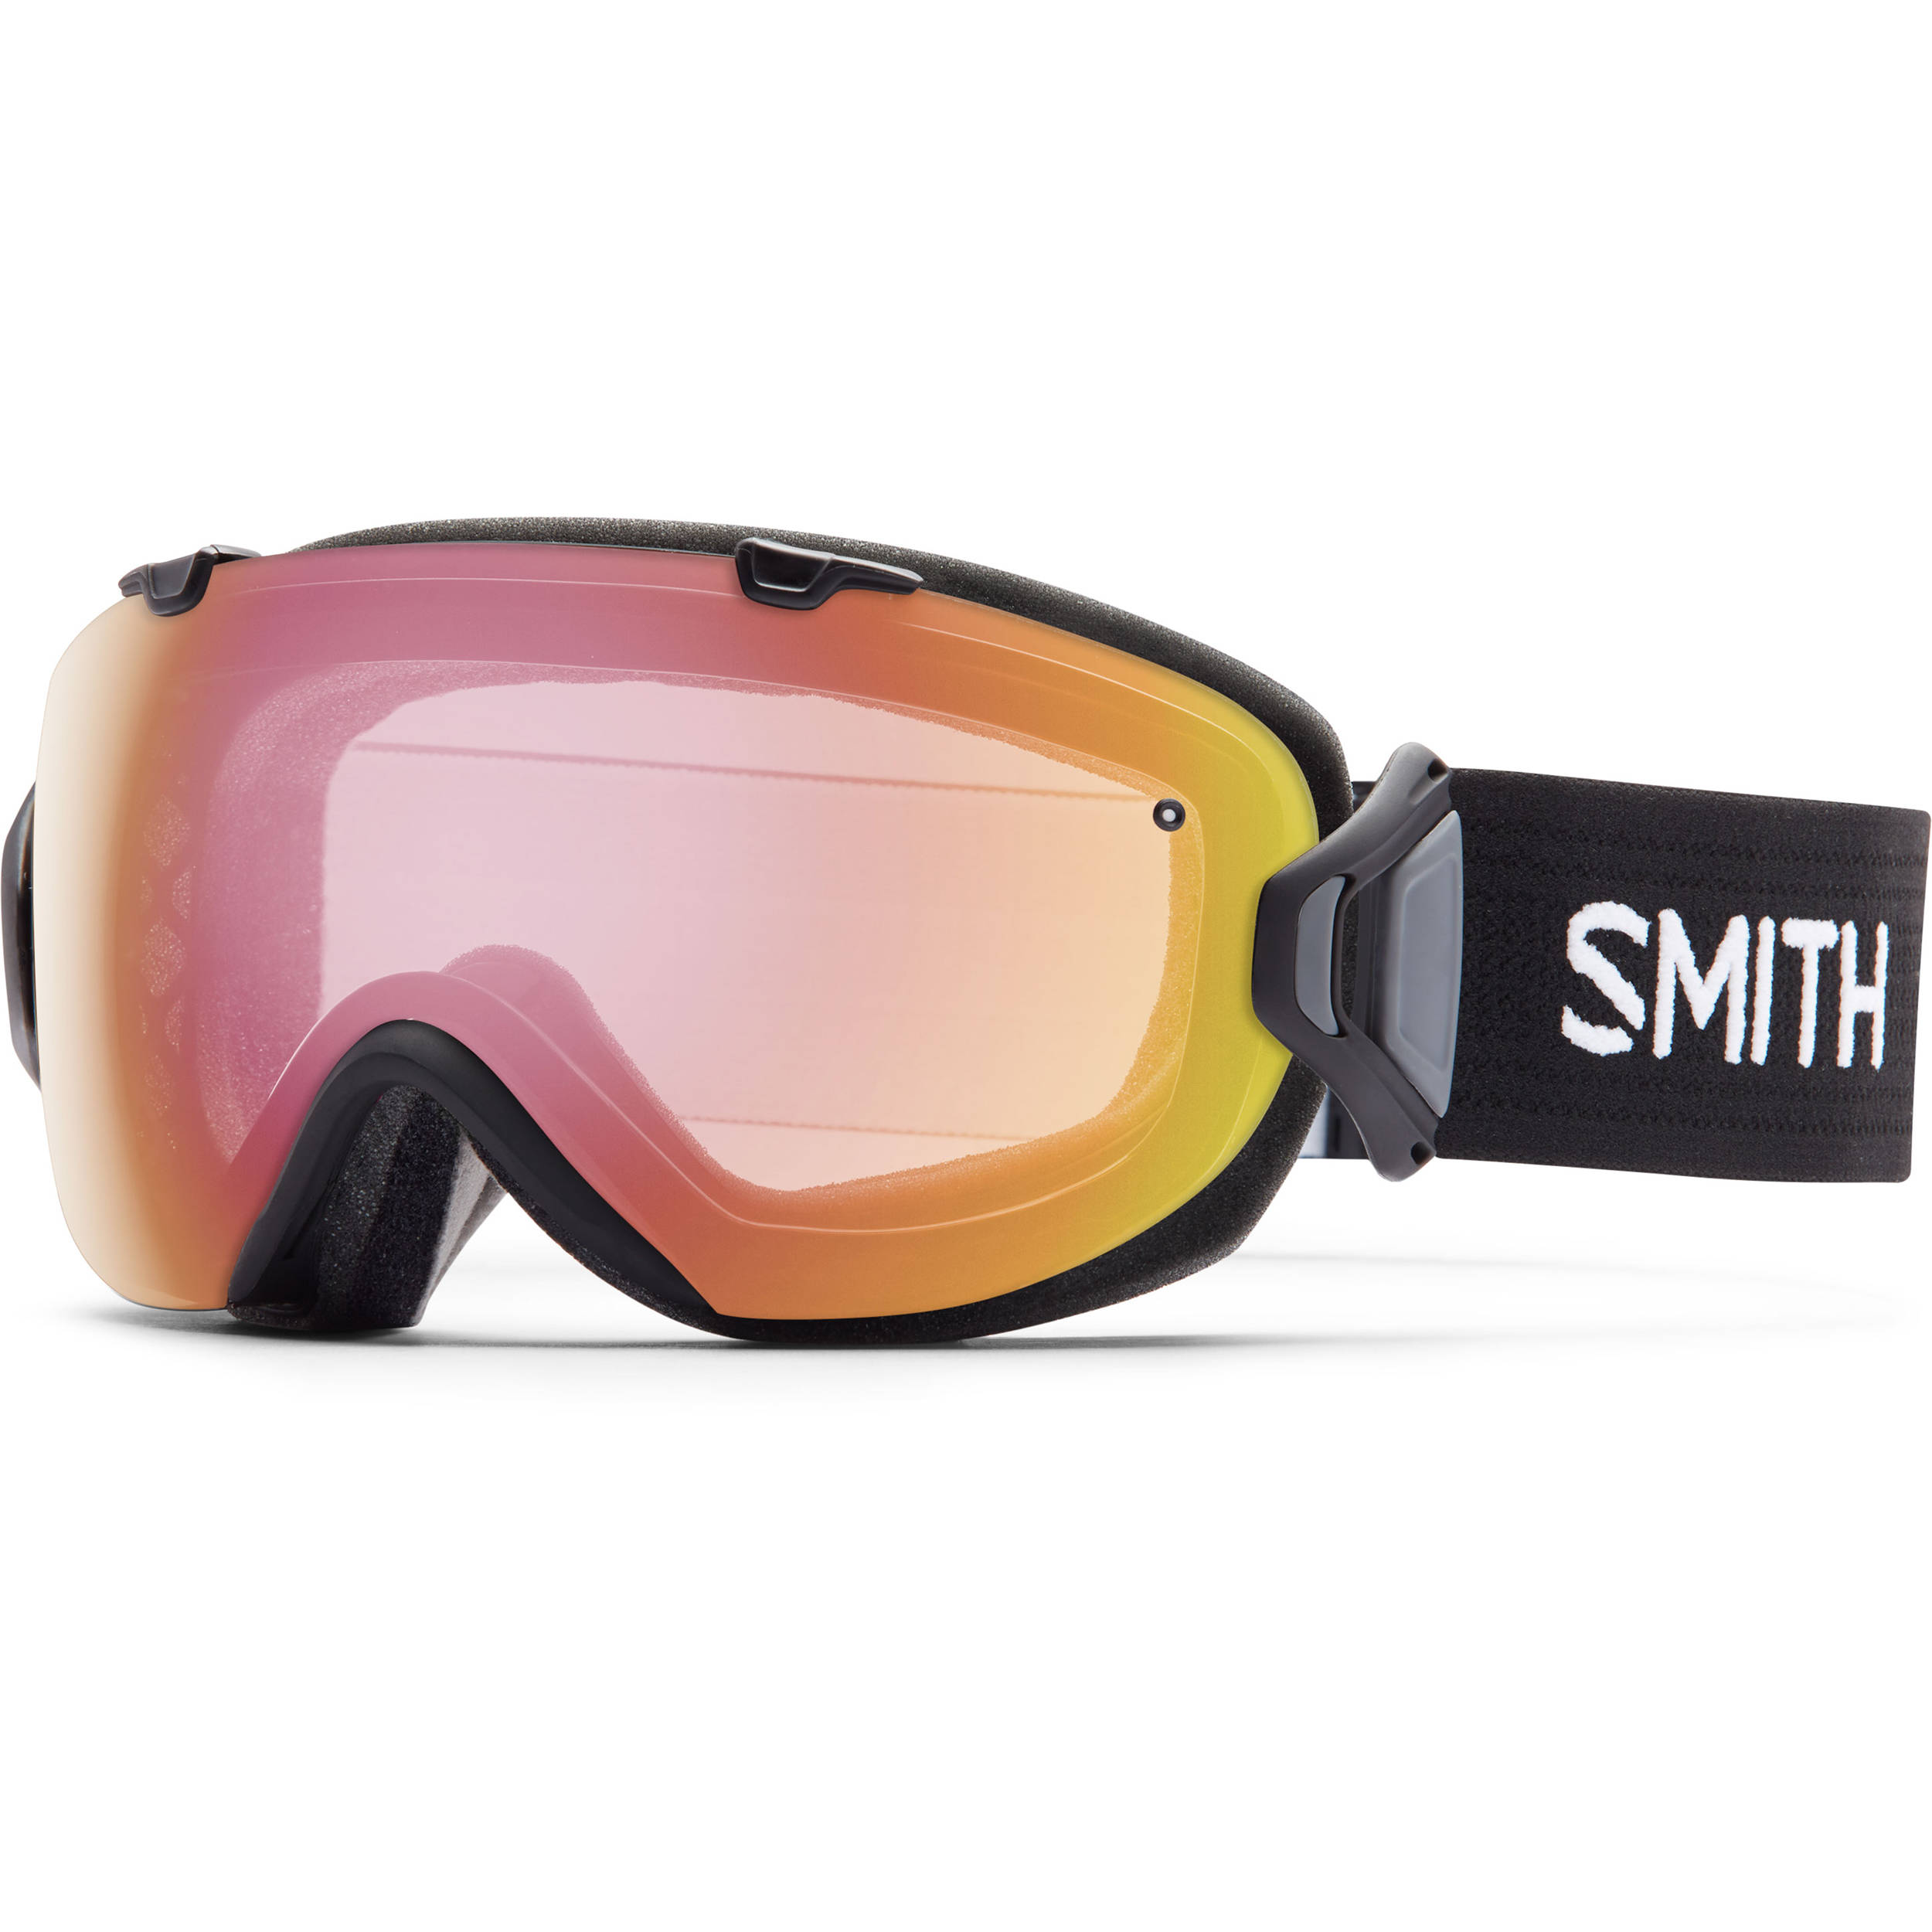 e61dae8c5d3 Smith Optics Women s Medium-Fit I O S Snow Goggle IS7PRZBK16 B H